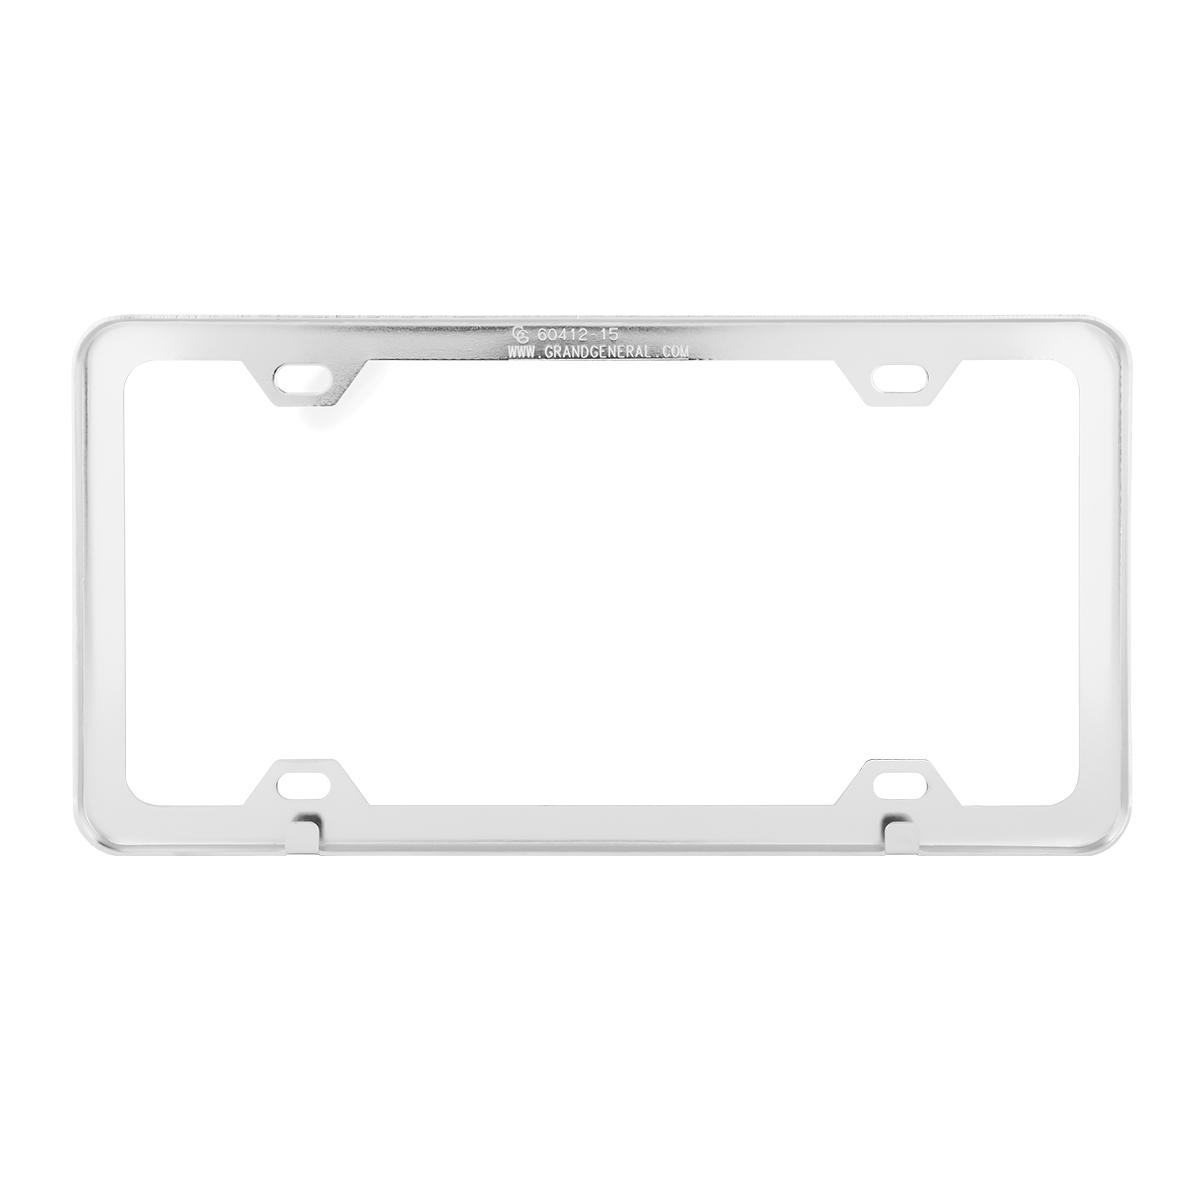 60412 Plain Chrome Plated 4 Hole License Plate Frame - Back View